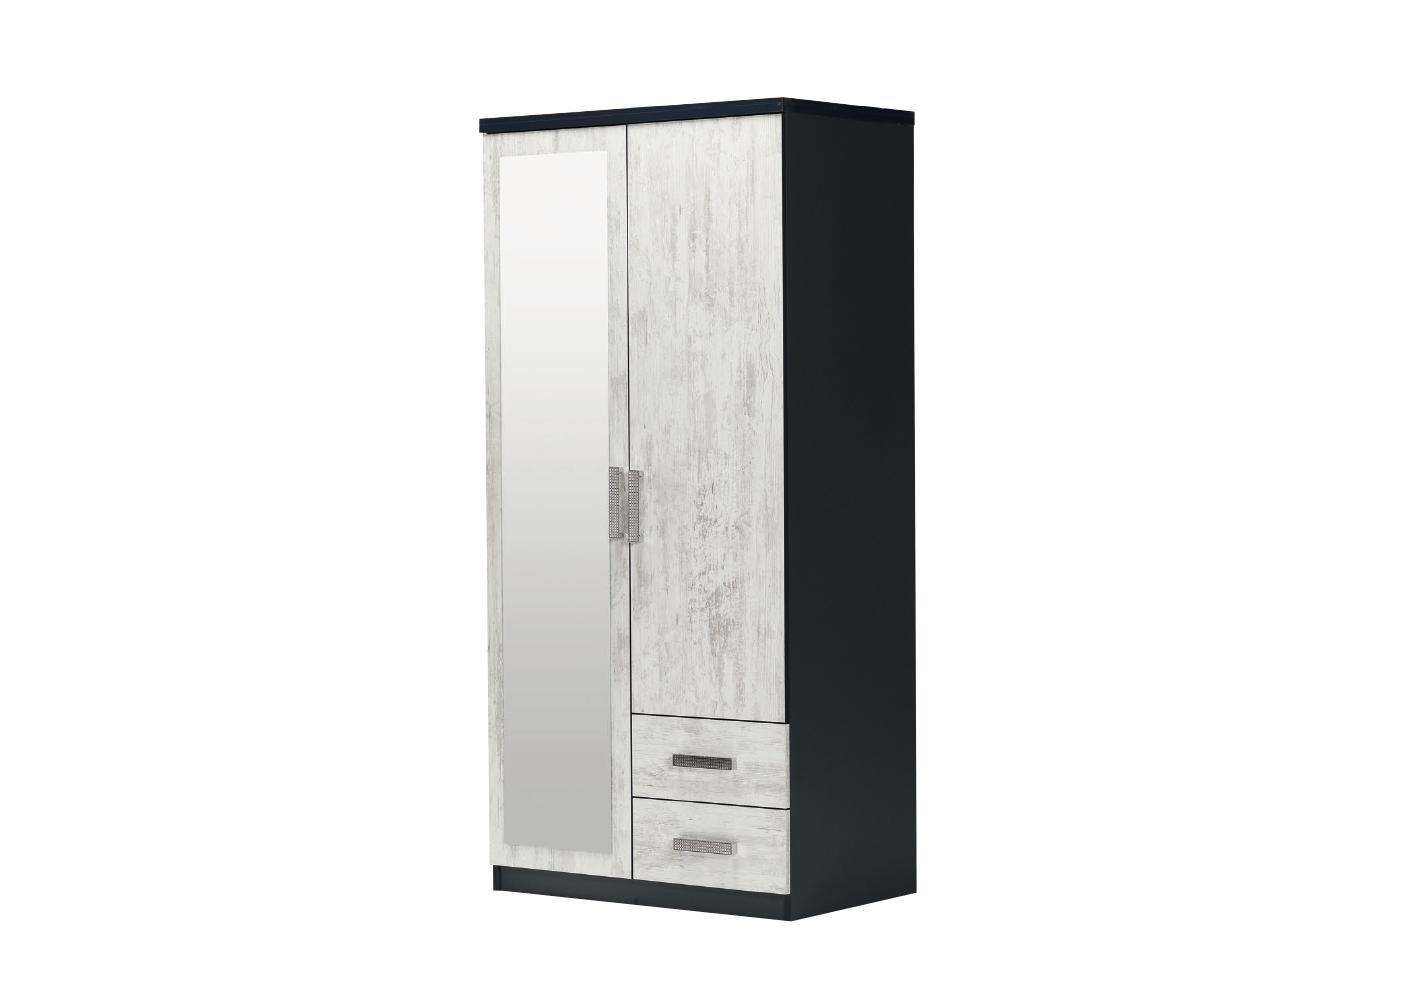 Armoire 2 portes 2 tiroirs miroir chêne blanc IBIZA